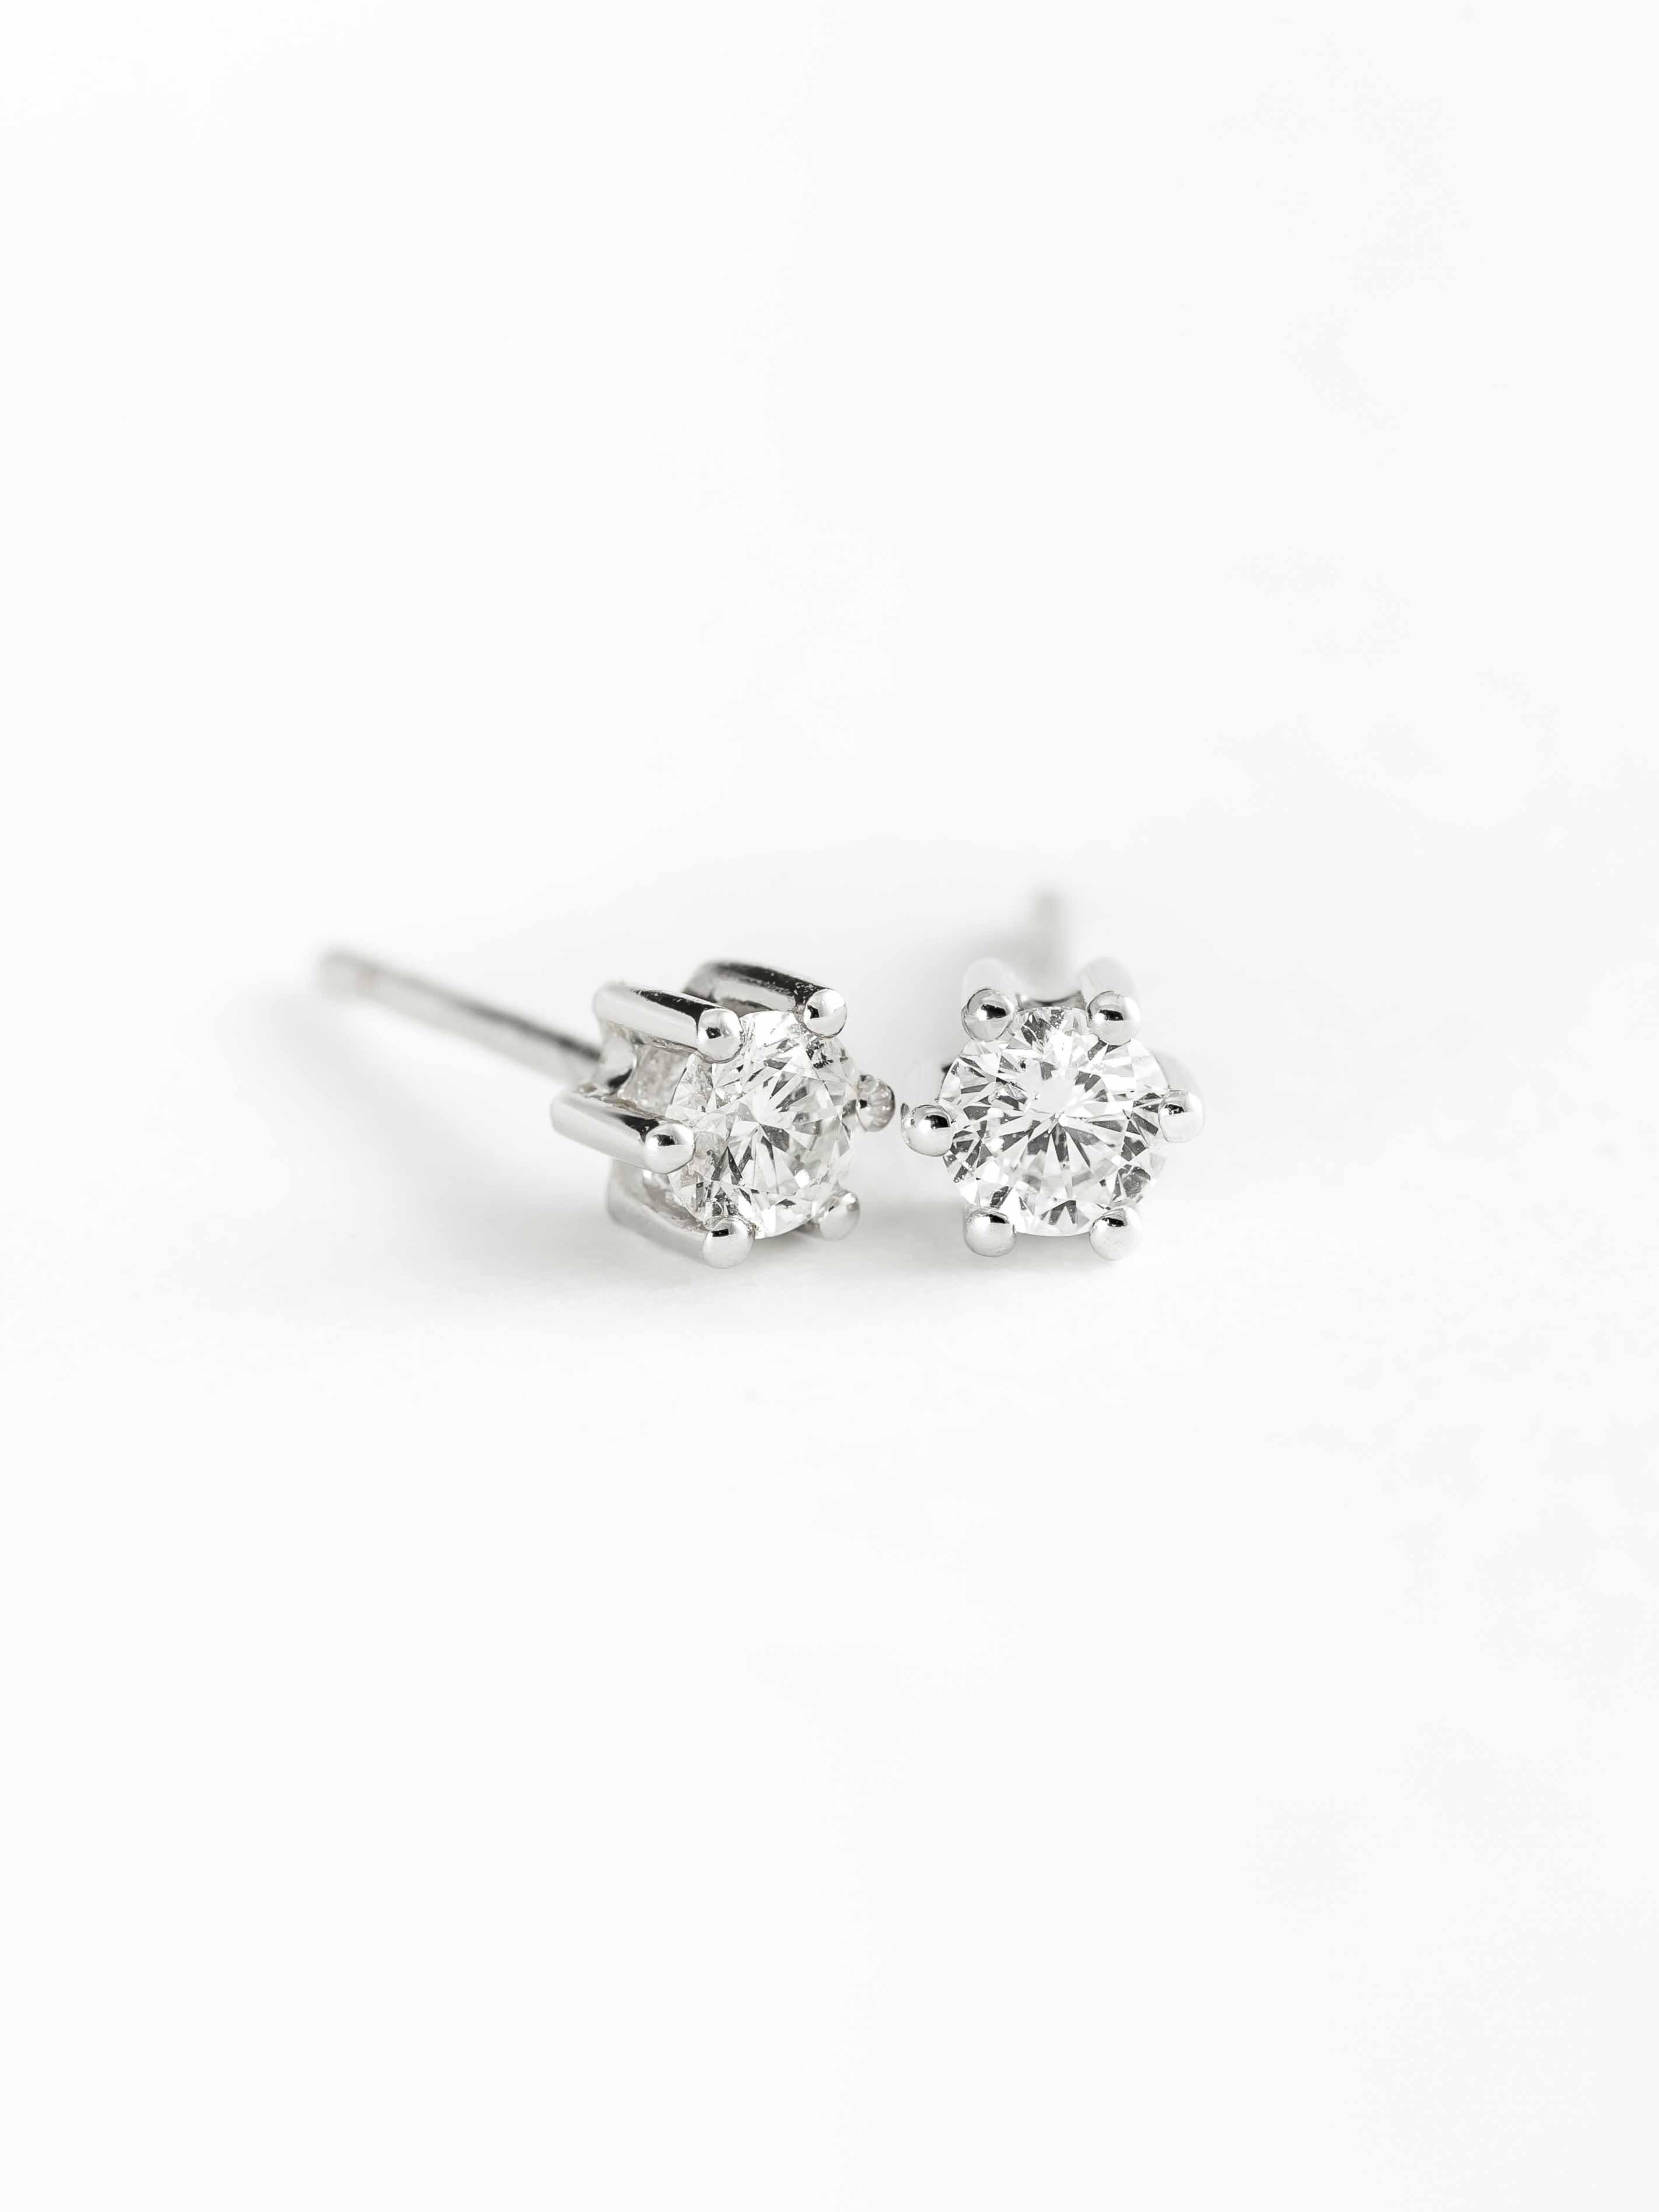 ea2d4bd55774 Pendientes oro blanco 18 Ktes con diamantes 0 16 Qtes - Jose Luis Joyero